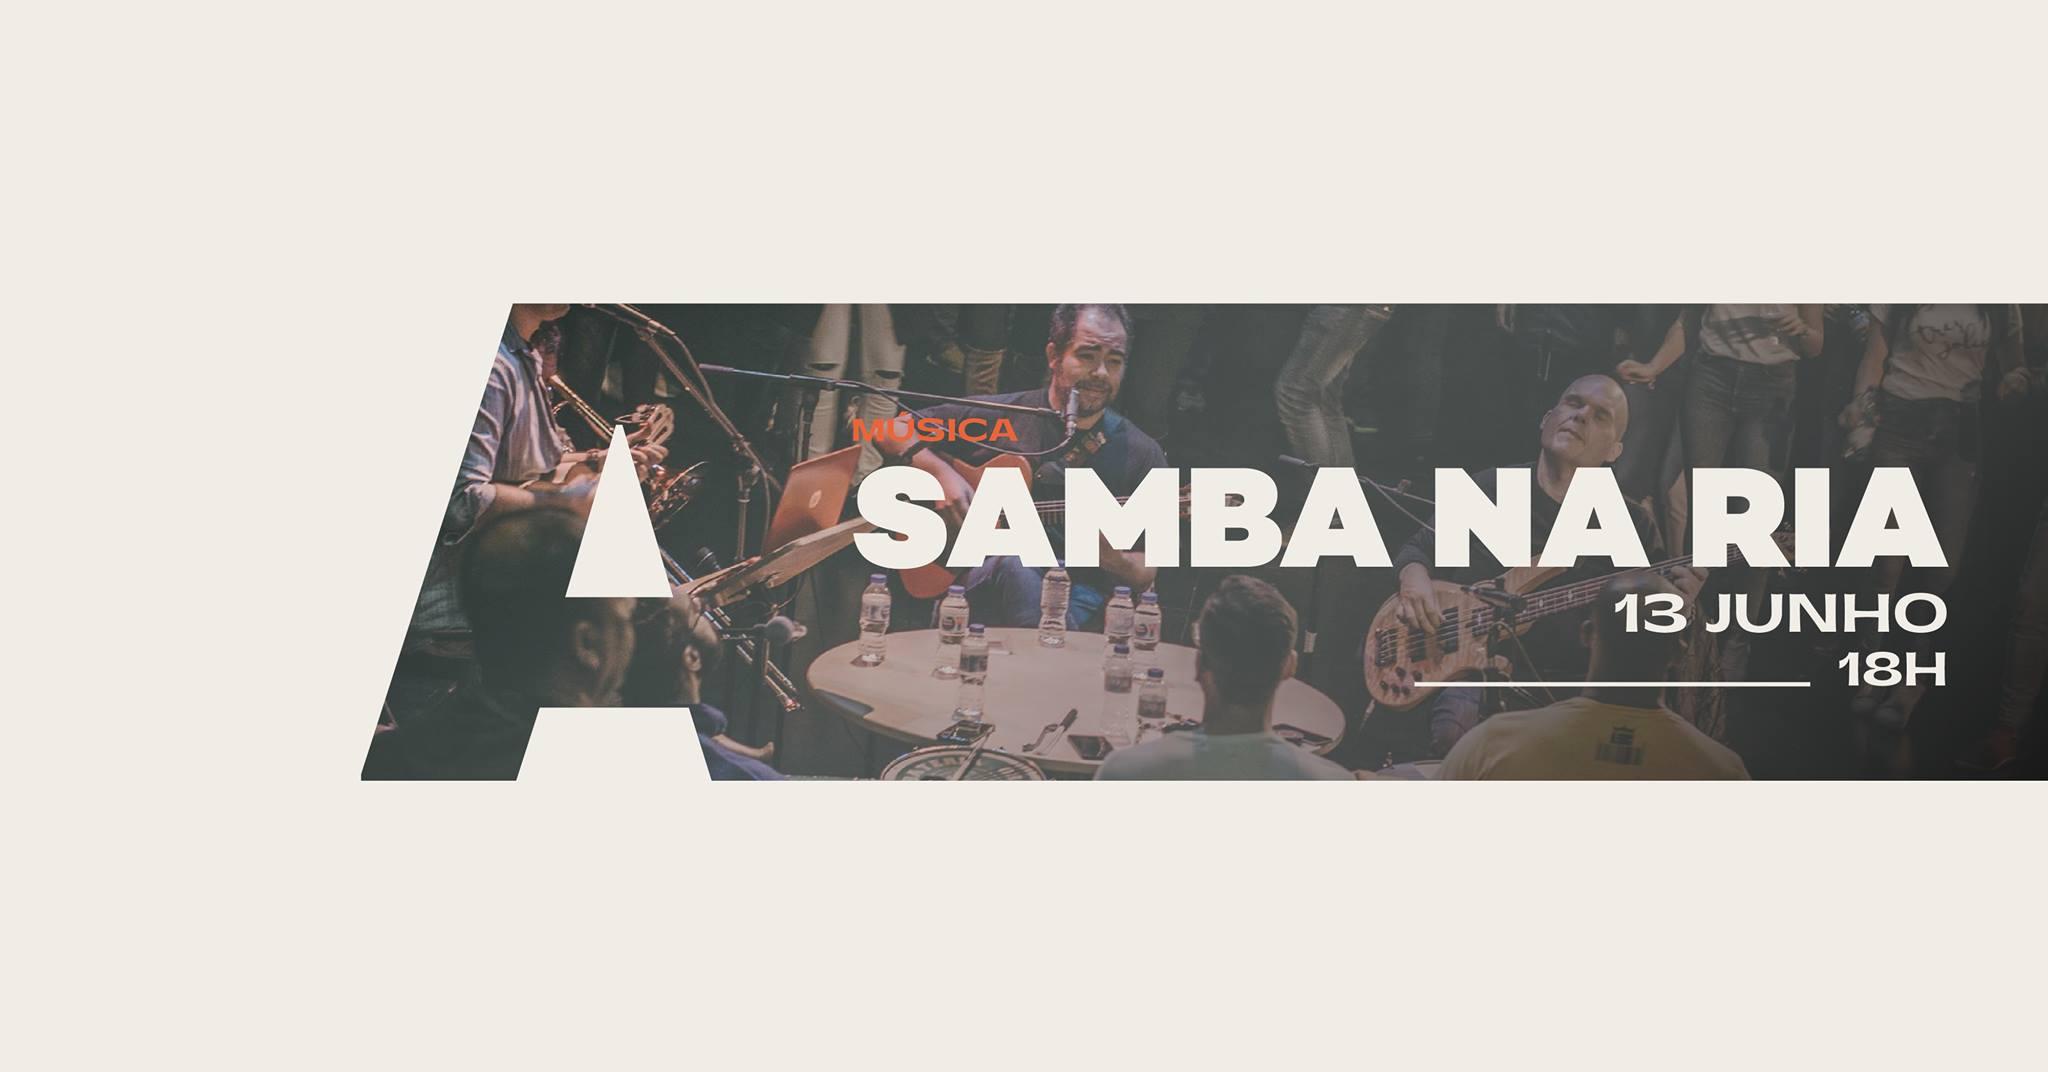 Palco Central apresenta Samba na Ria @AvenidaCC